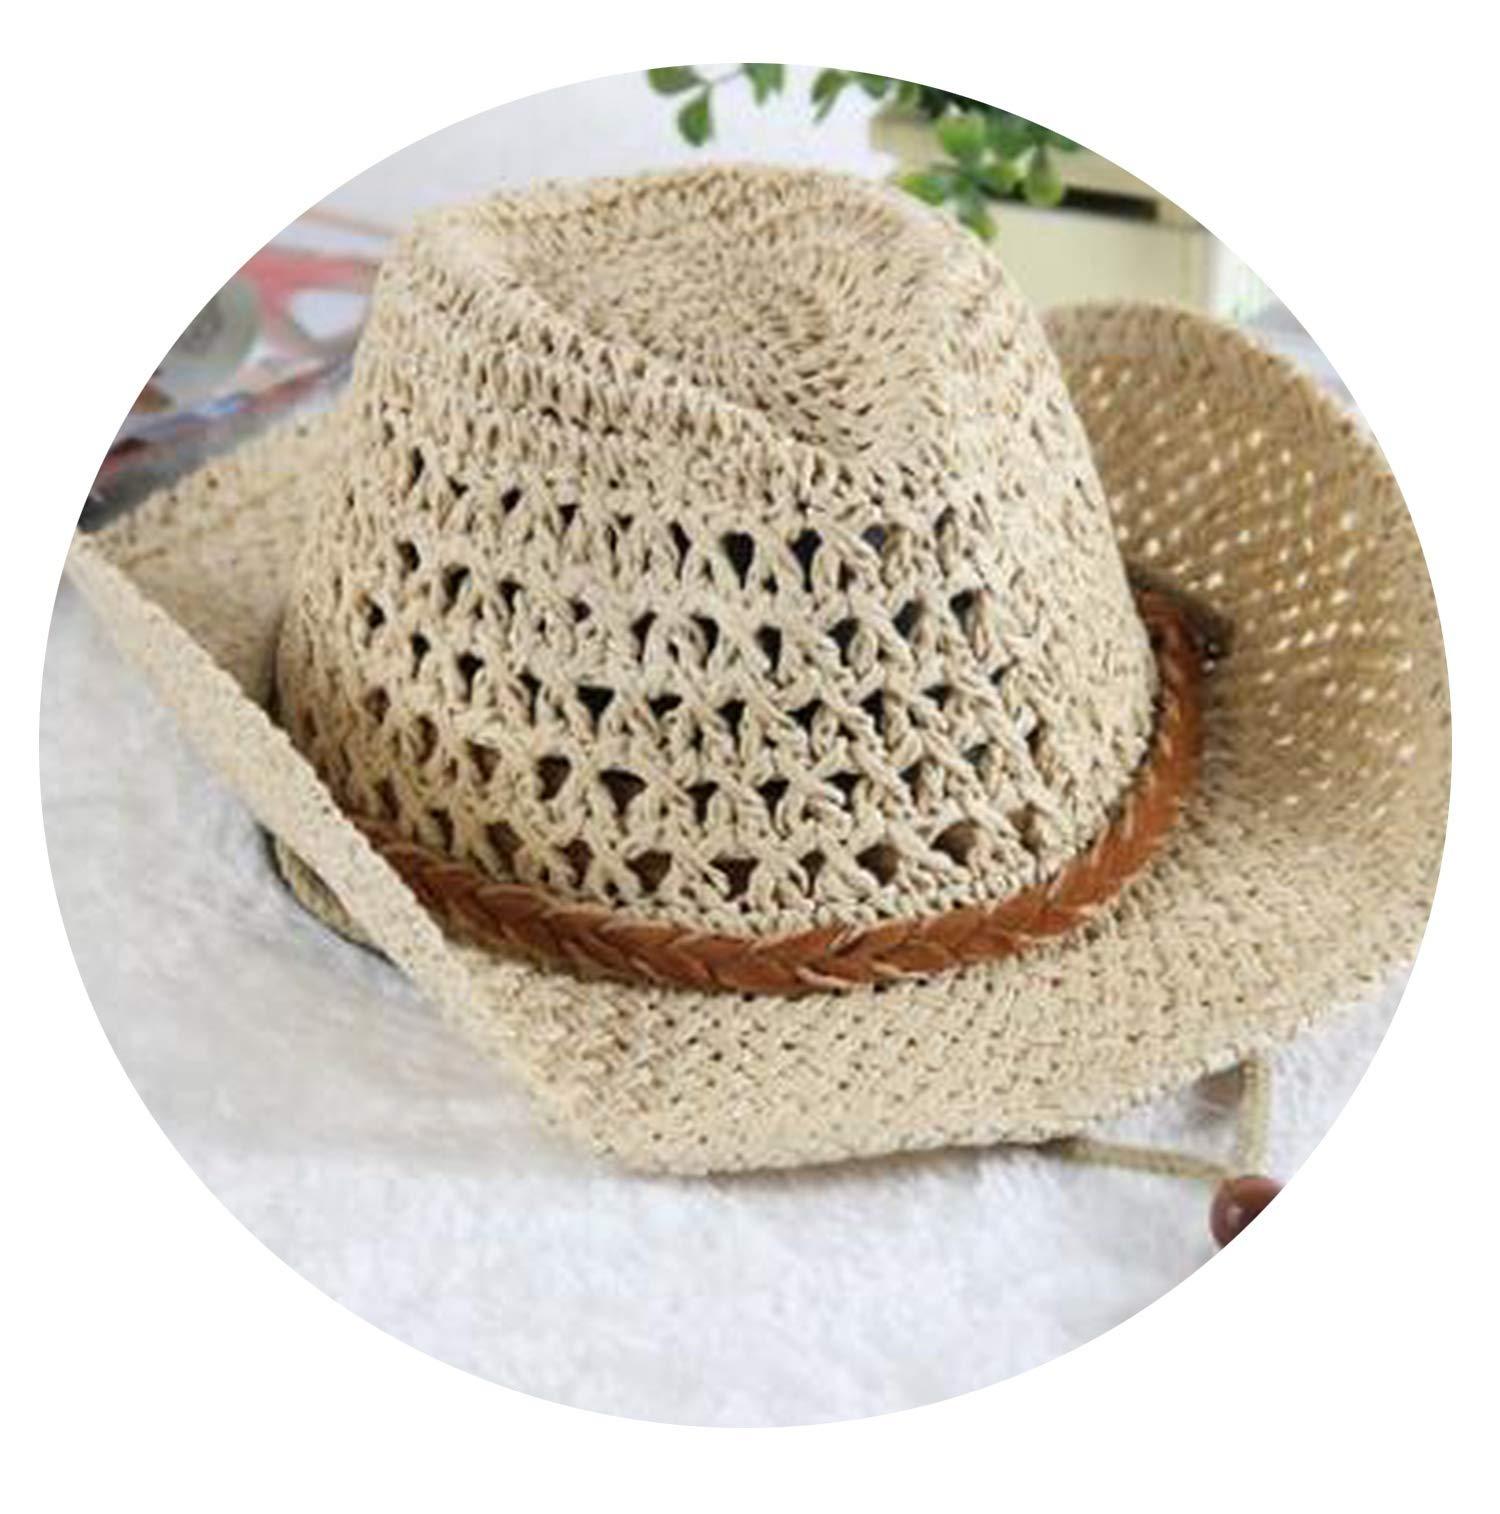 2 3 4 5 6 Years Cowboy Hat Summer Boy's Sun Hat Straw Cap Beach Hat for Kids,Rice White,for Child